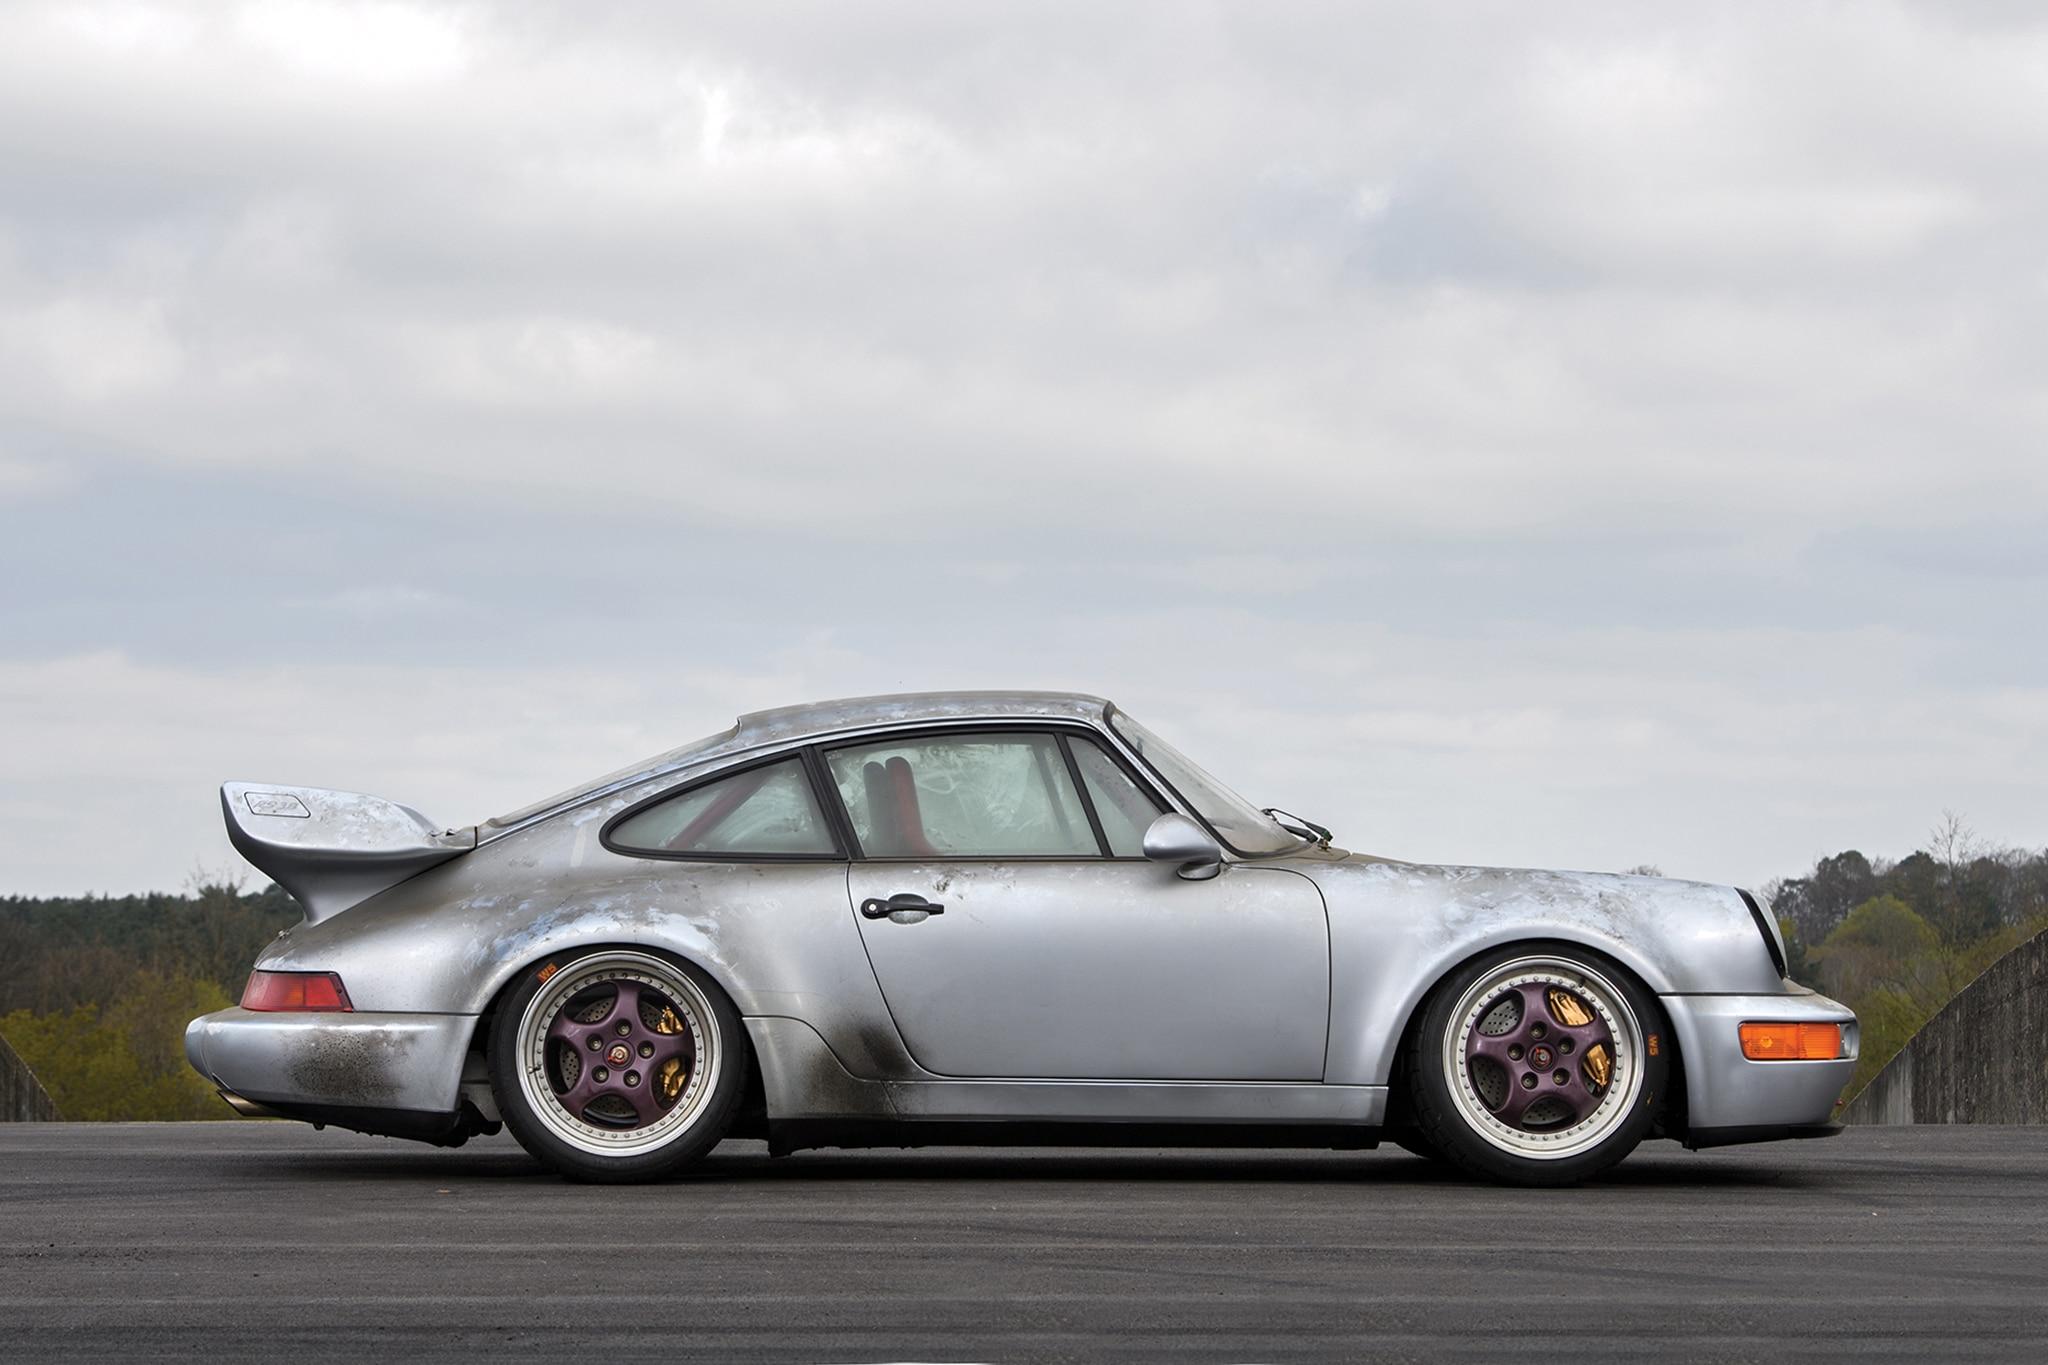 Just Listed Untouched Unrestored 1993 Porsche 964 Carrera Rsr Automobile Magazine